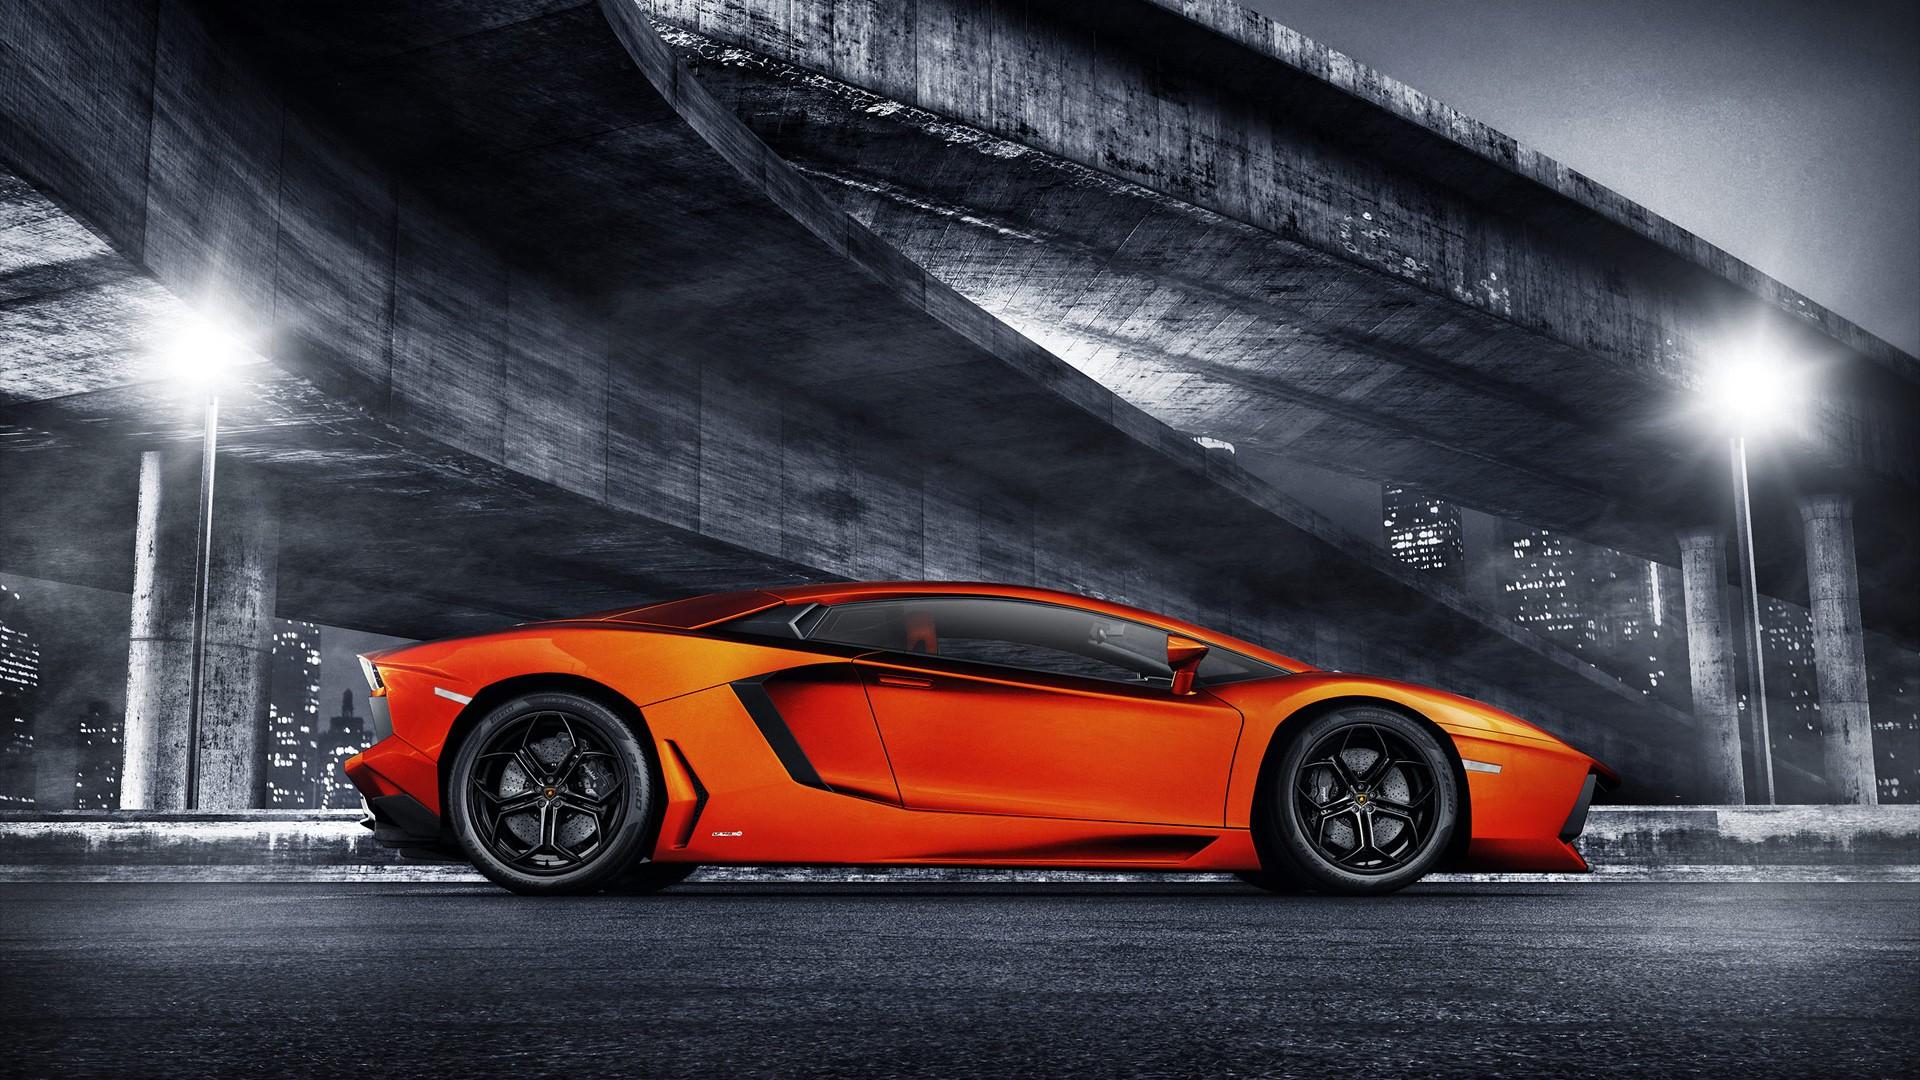 Rolls Royce Bentley >> Orange Lamborghini Aventador Wallpaper | HD Car Wallpapers | ID #3444